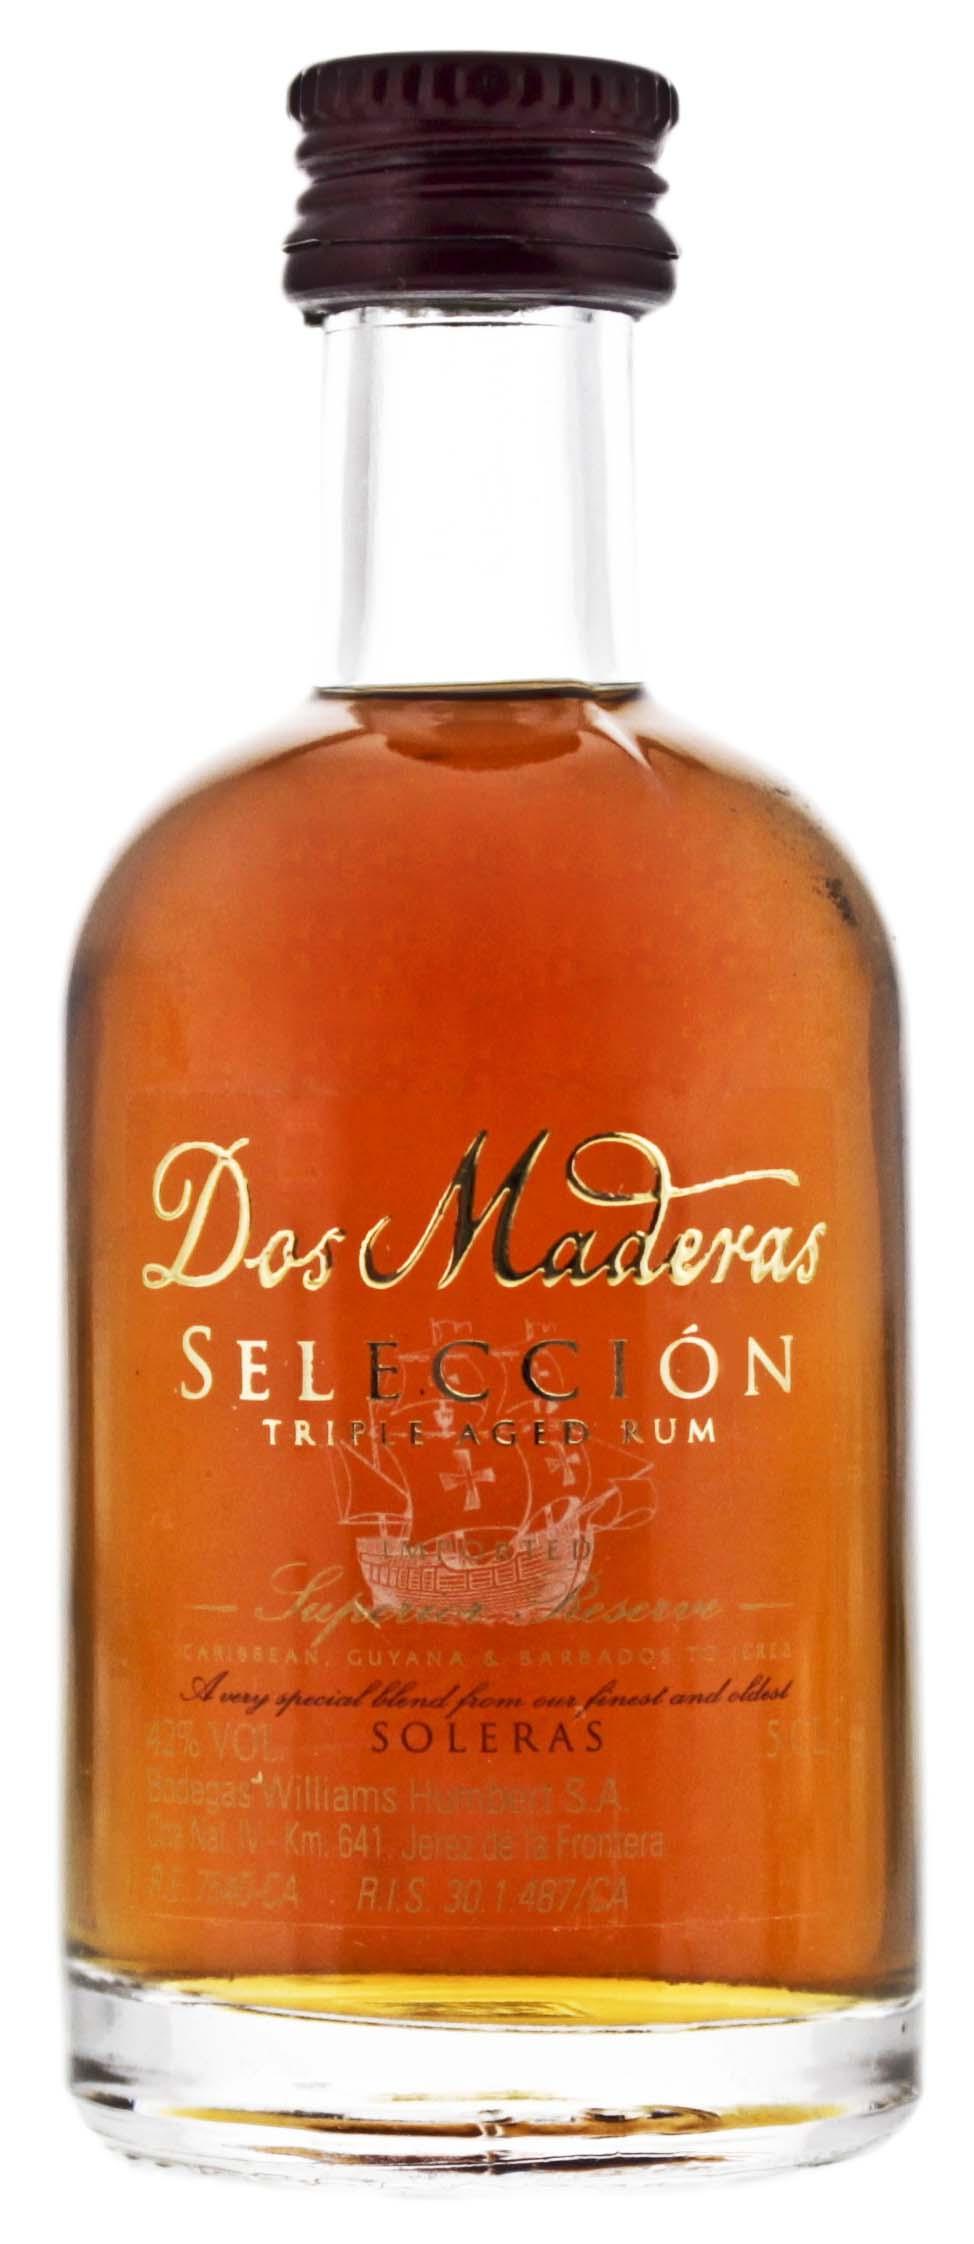 Dos Maderas Seleccion Miniatures 0,05L